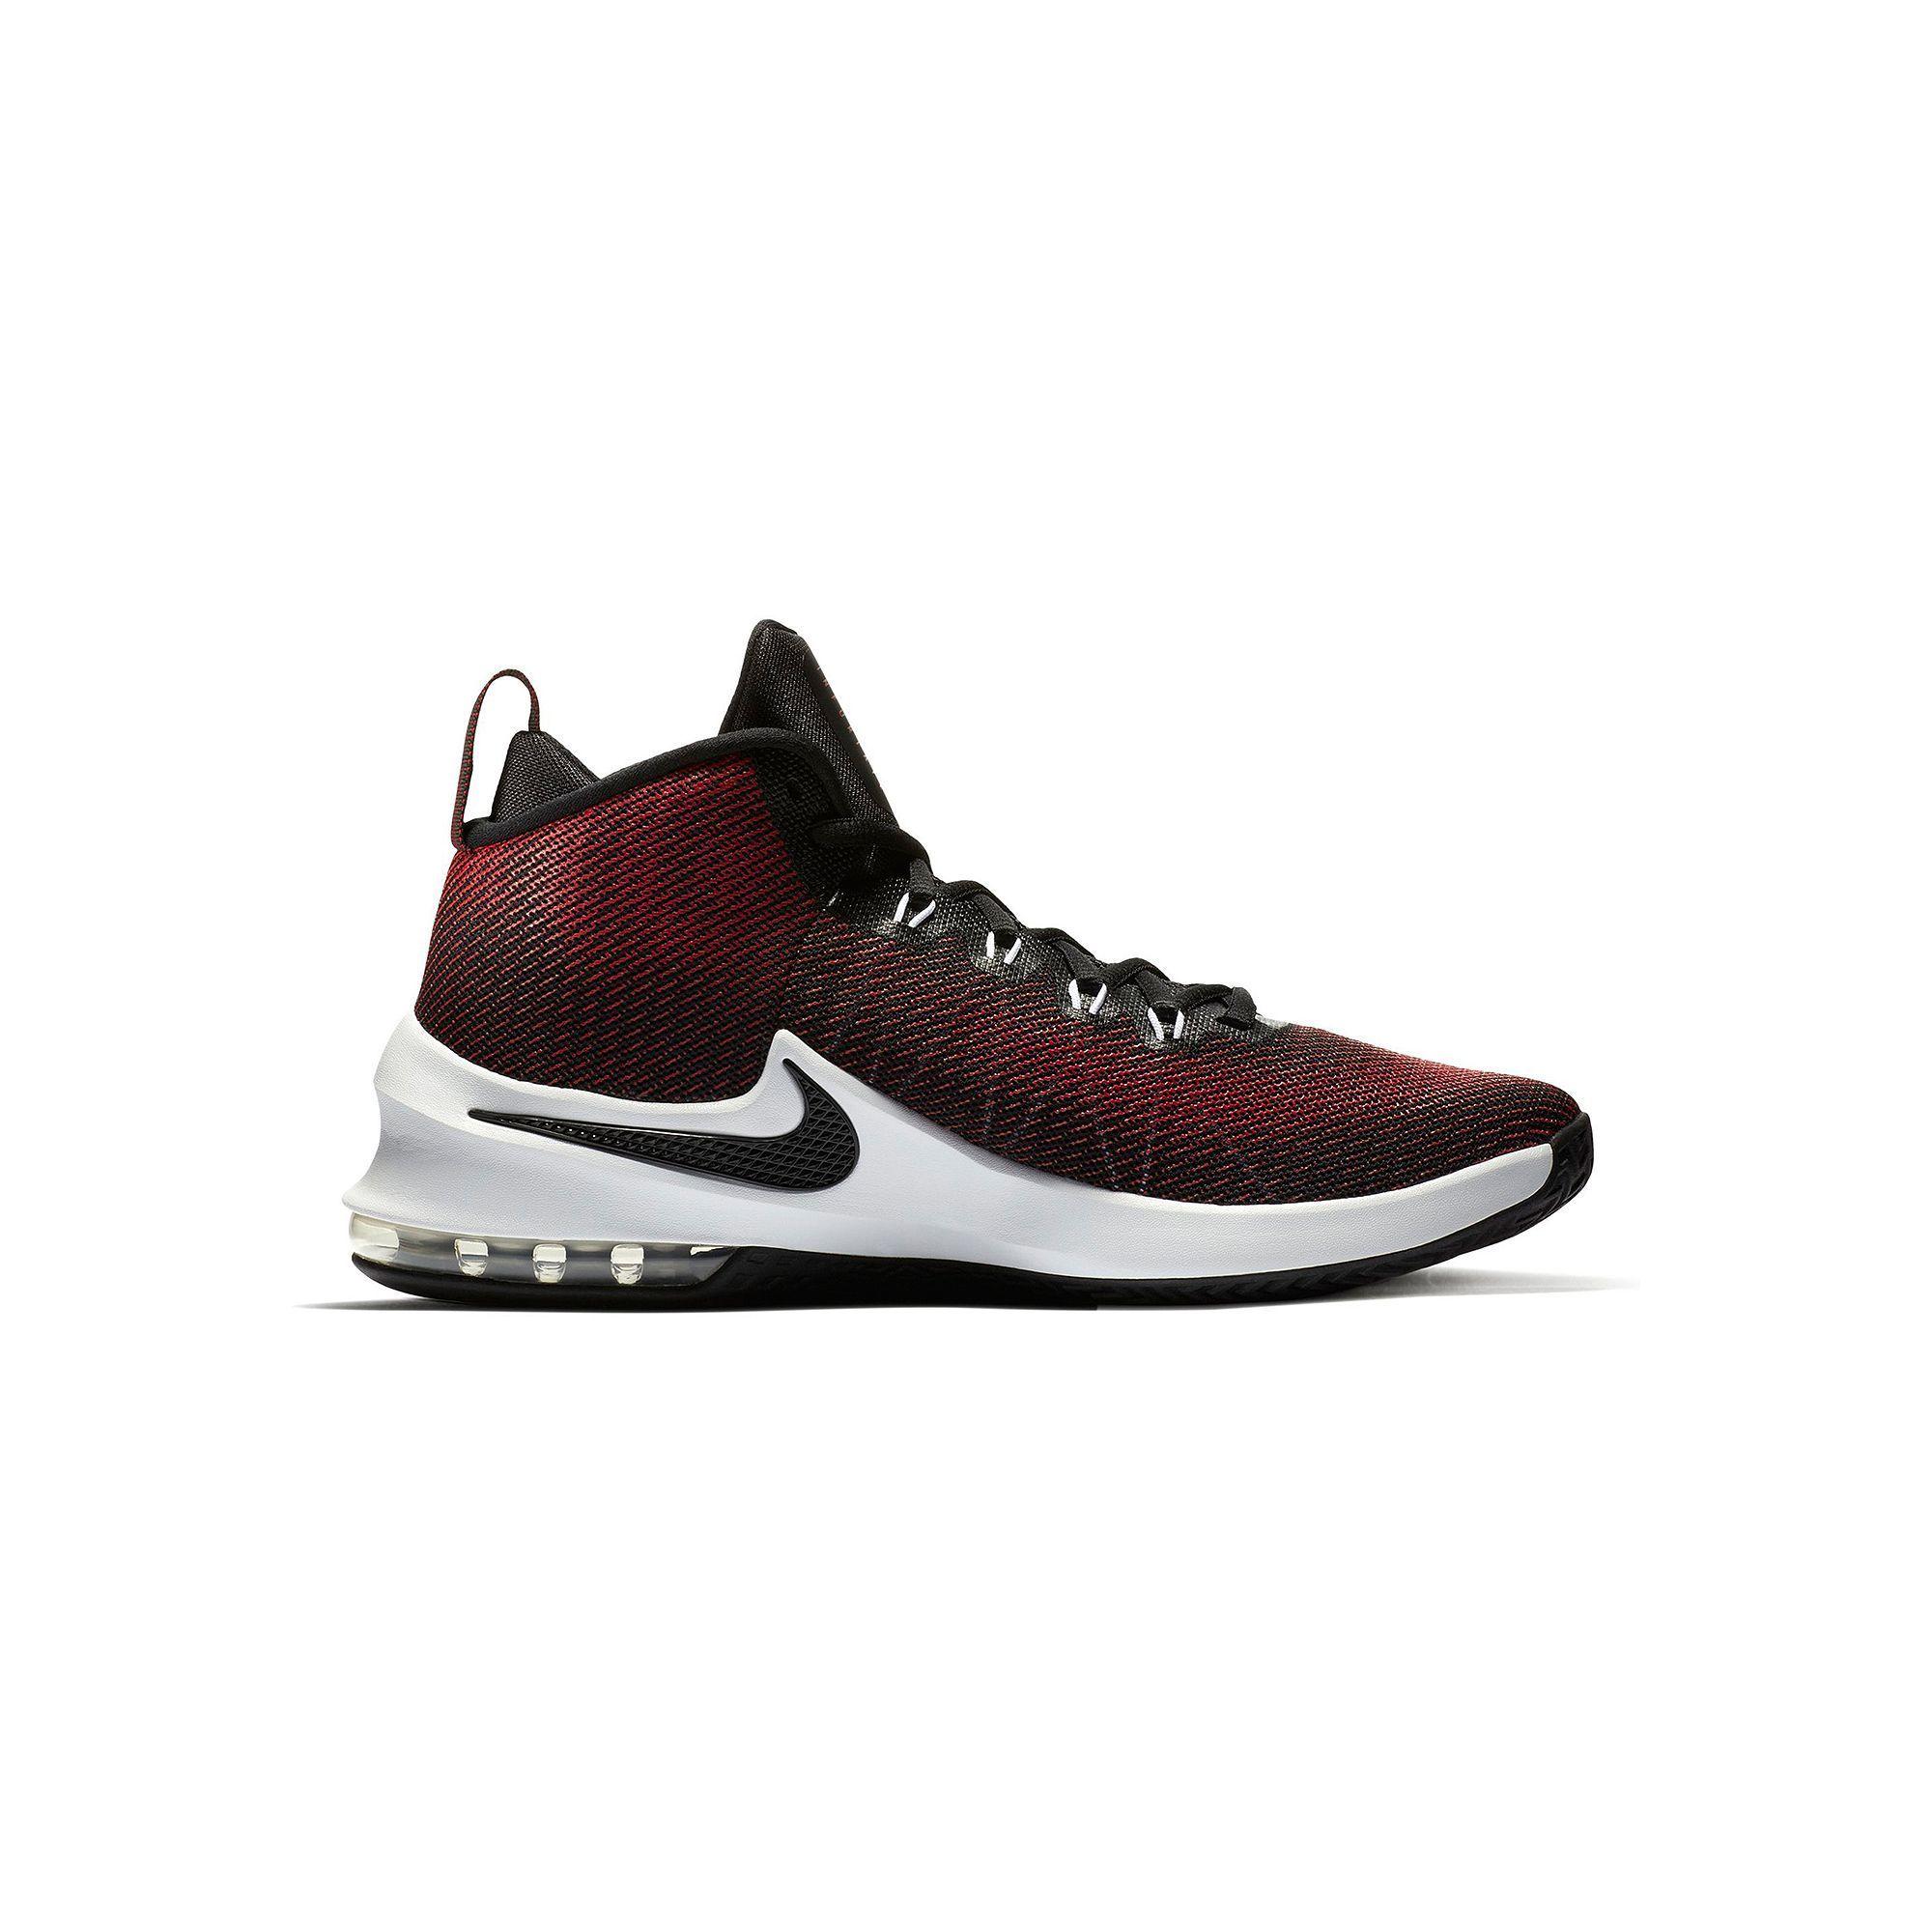 be85f0cda6c Nike Air Max Infuriate Mid Men s Basketball Shoes